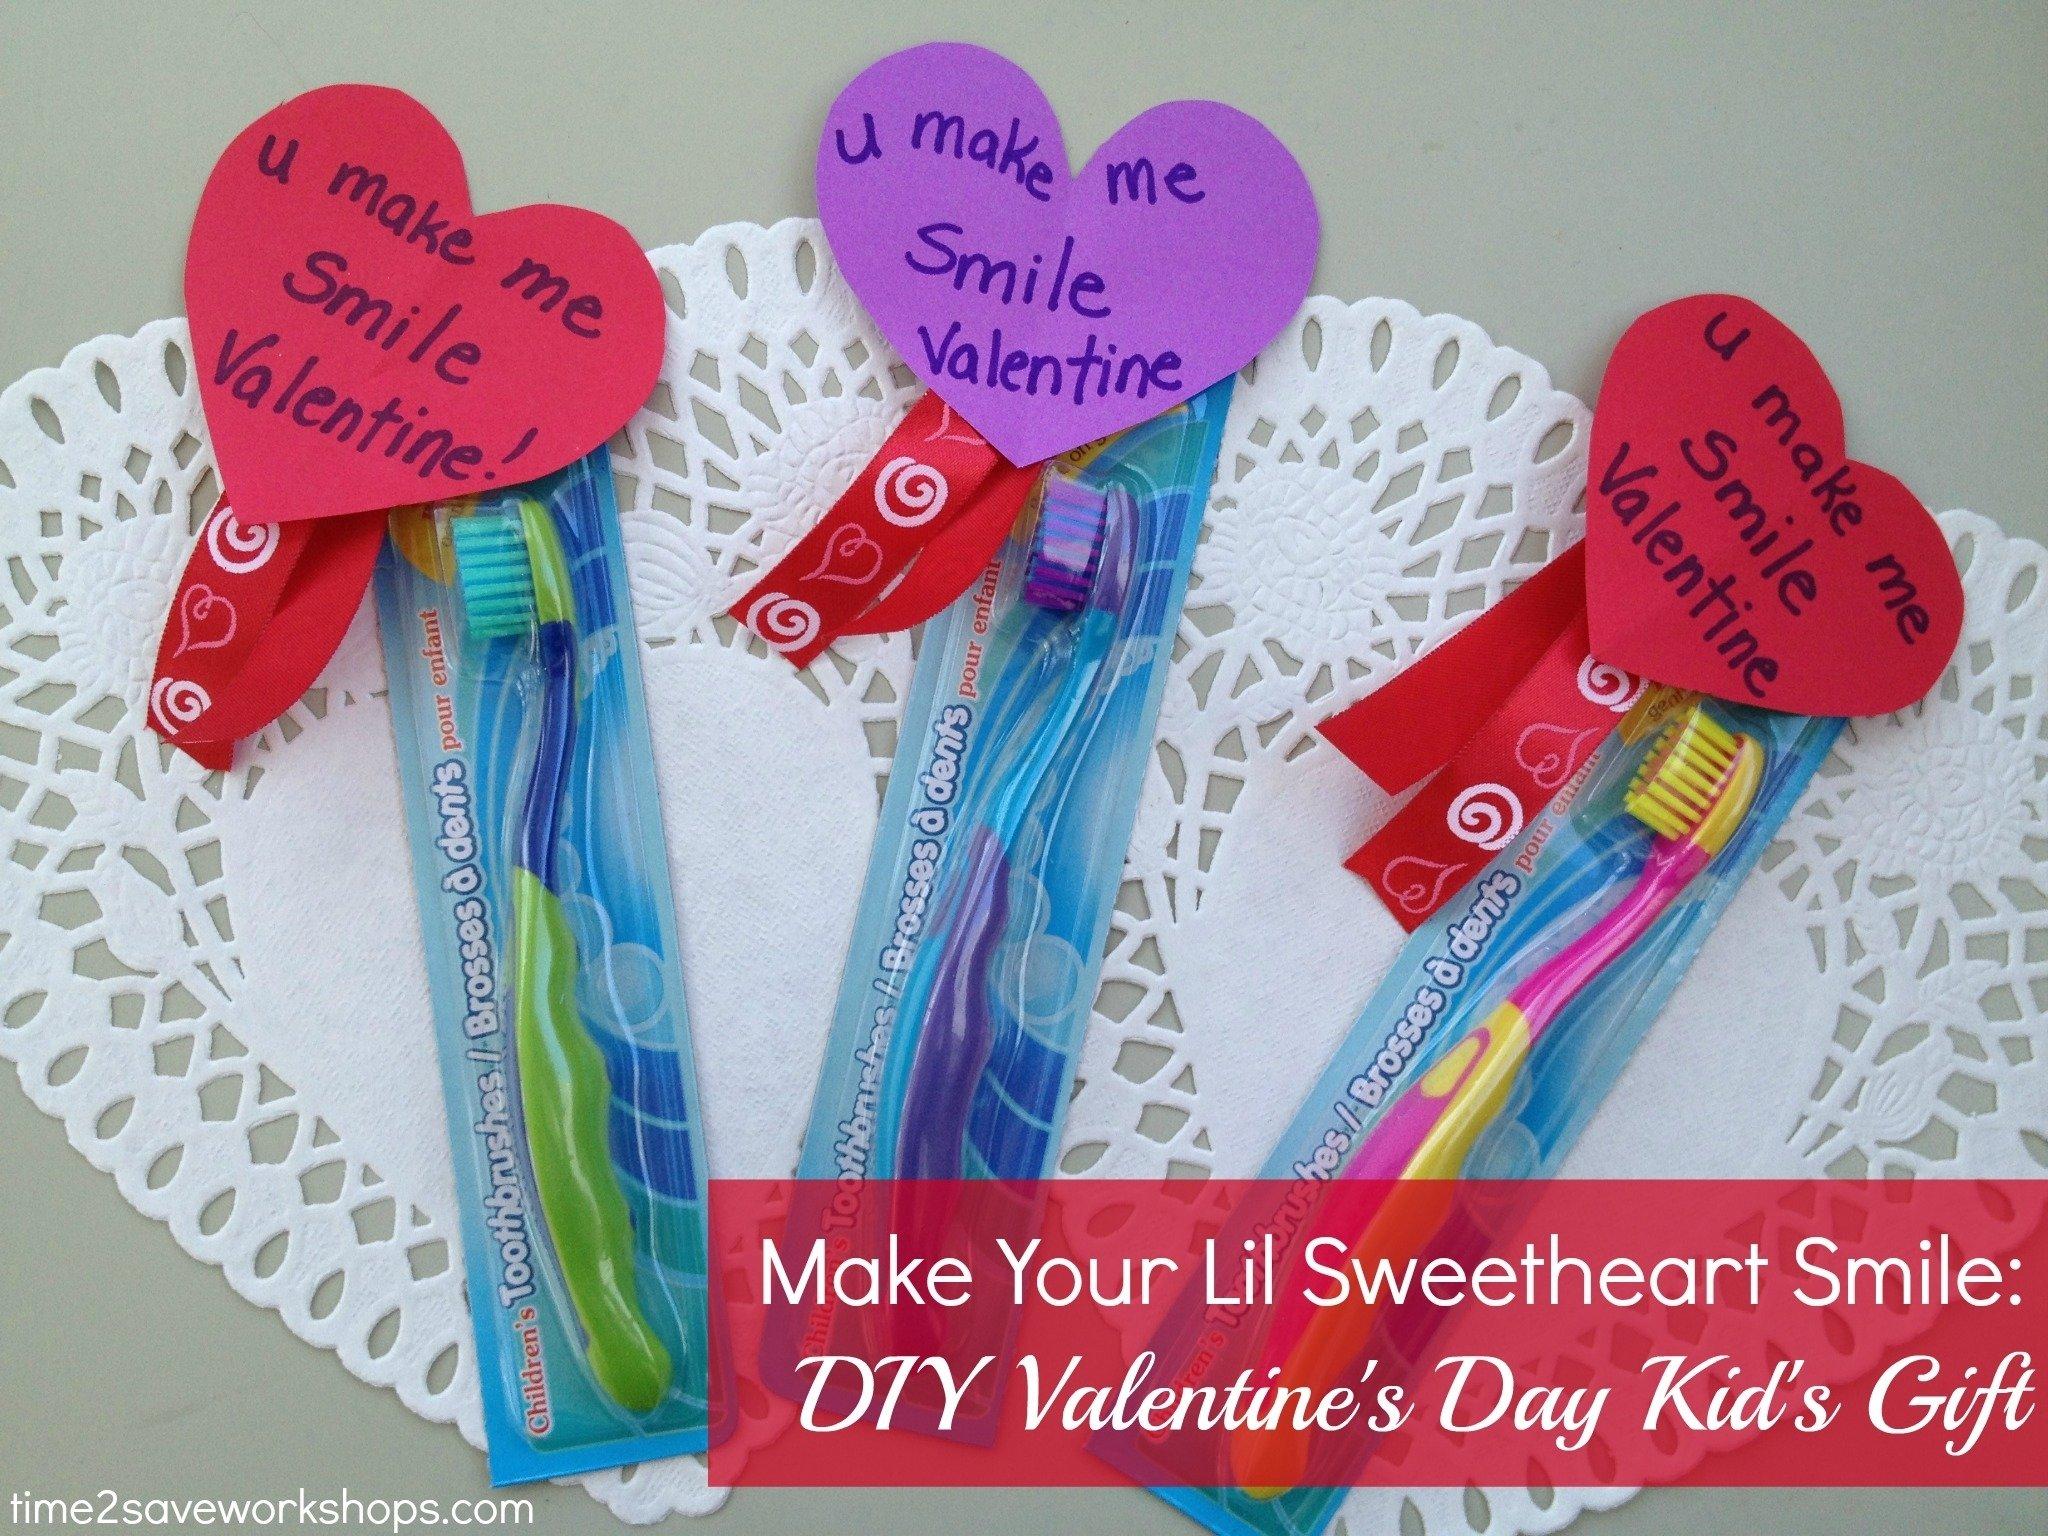 10 Ideal Valentine Gift Ideas For Kids valentine gifts cool hivewallpaper tierra este 37373 2020